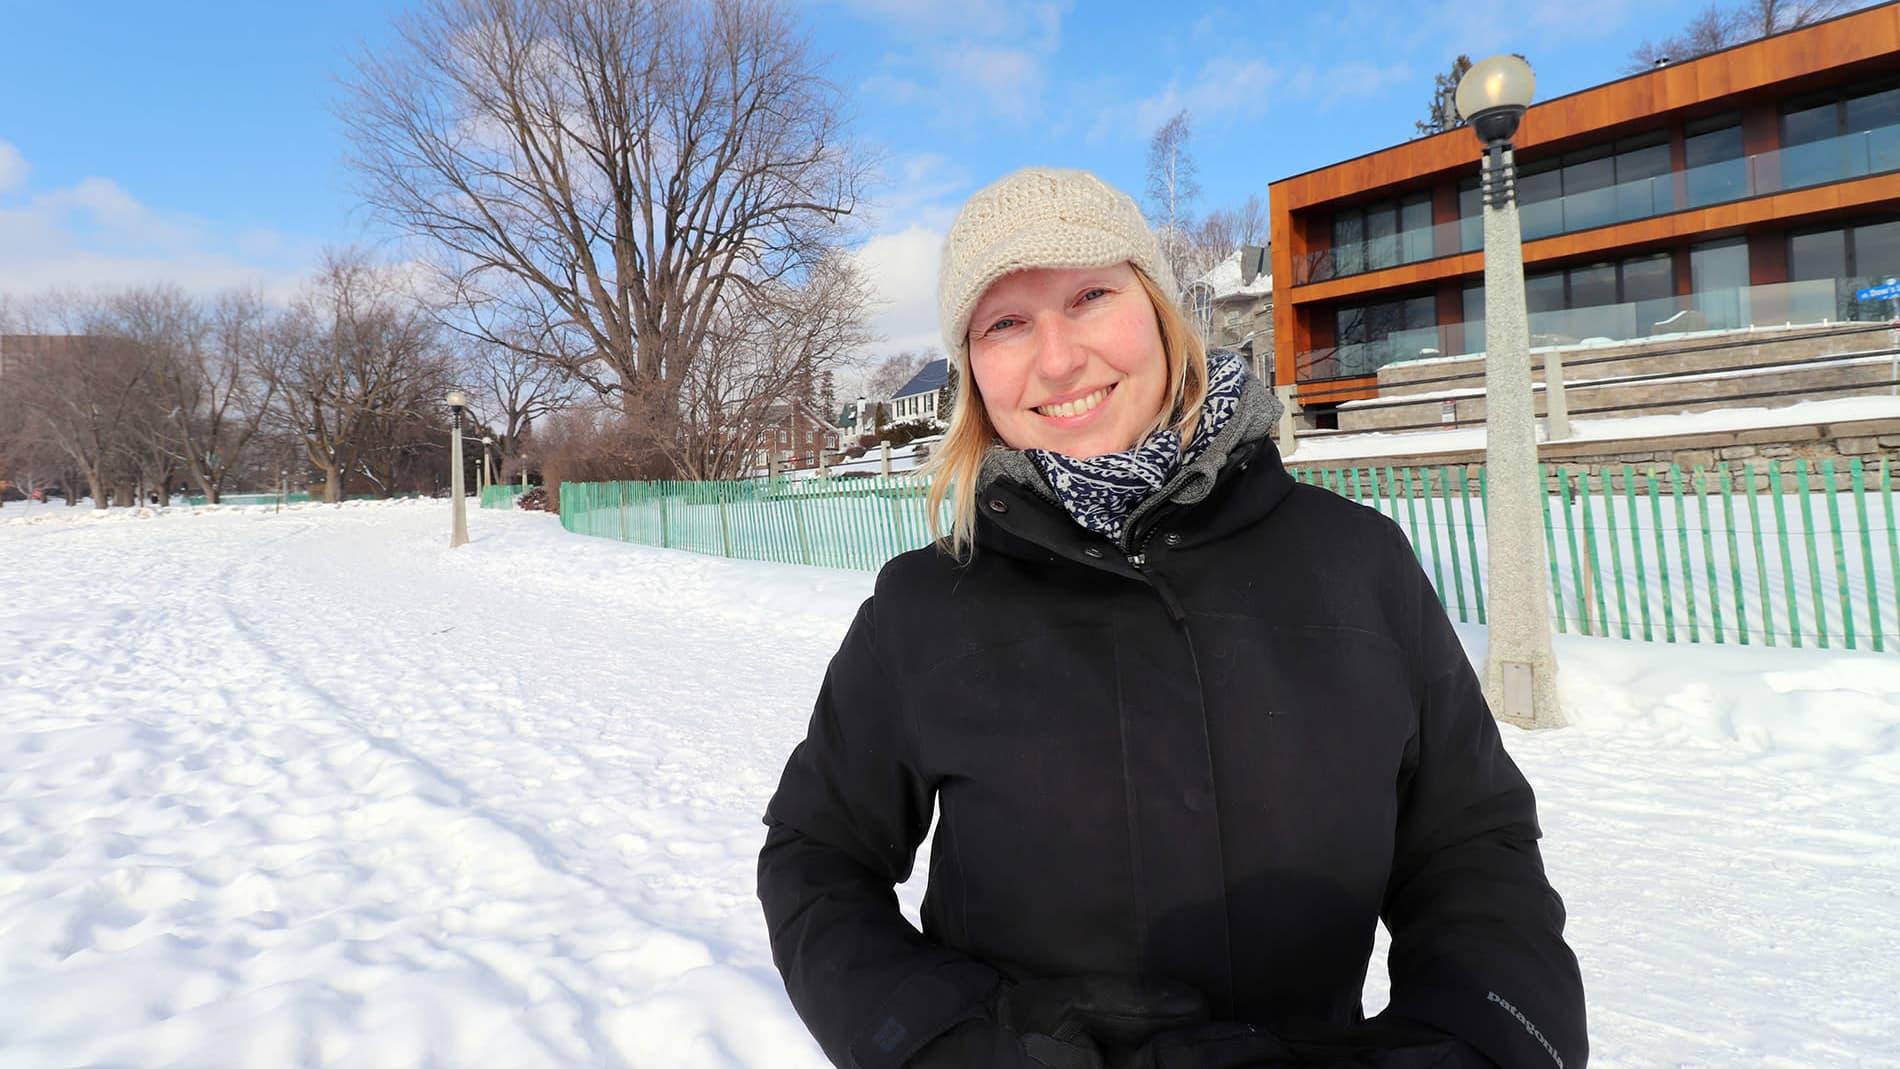 Annika Rautiola puistossa Torontossa